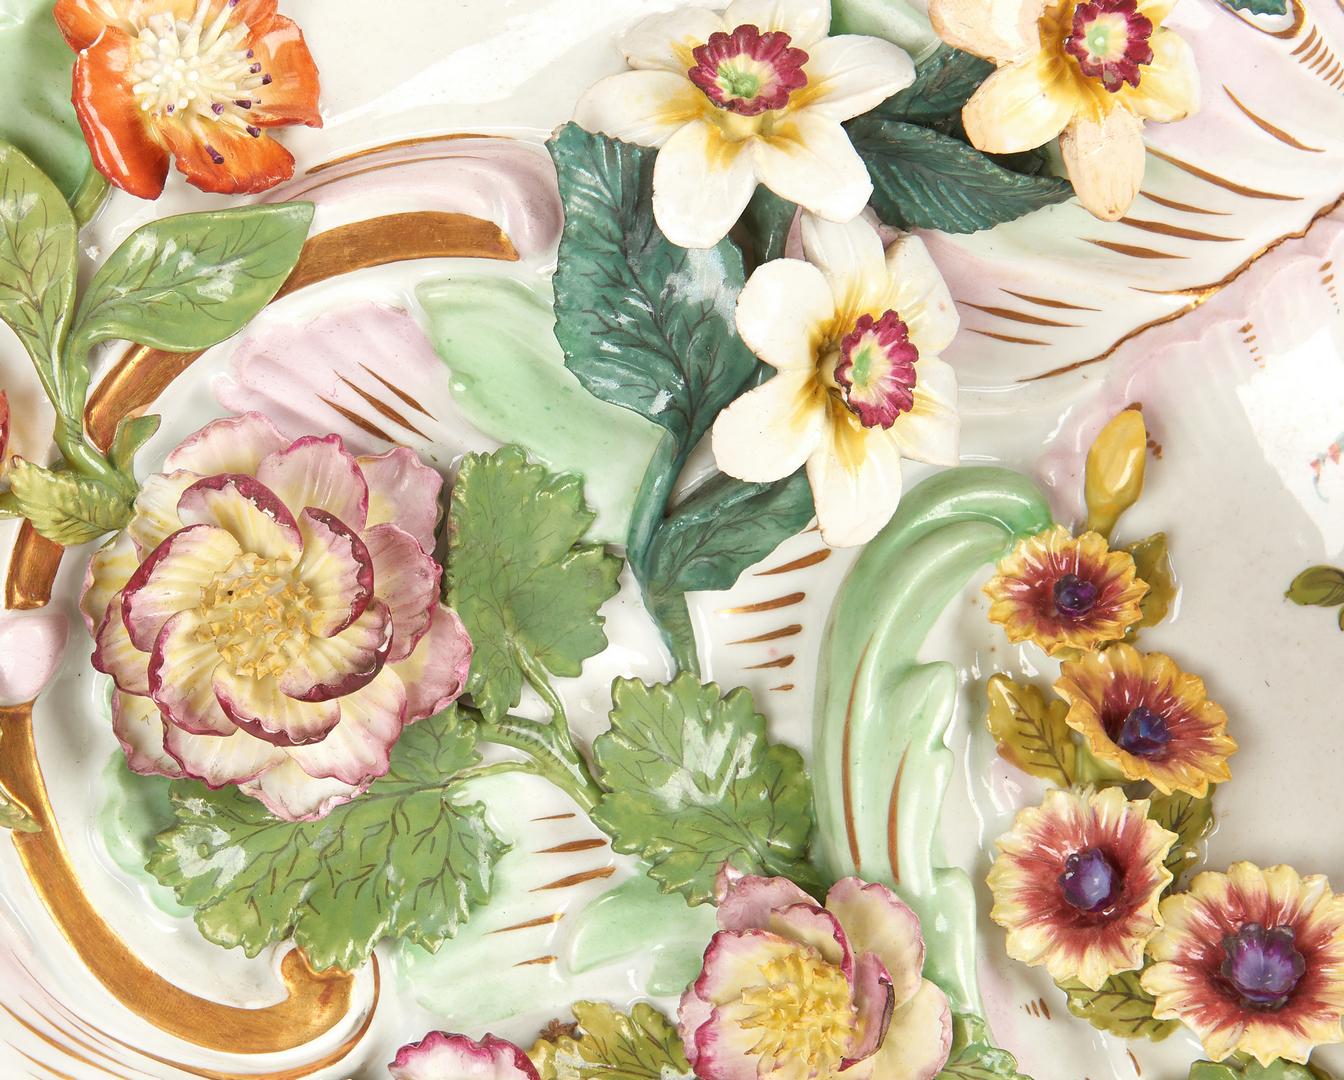 Lot 261: Pr. Large Meissen Style Porcelain Bracket Shelves